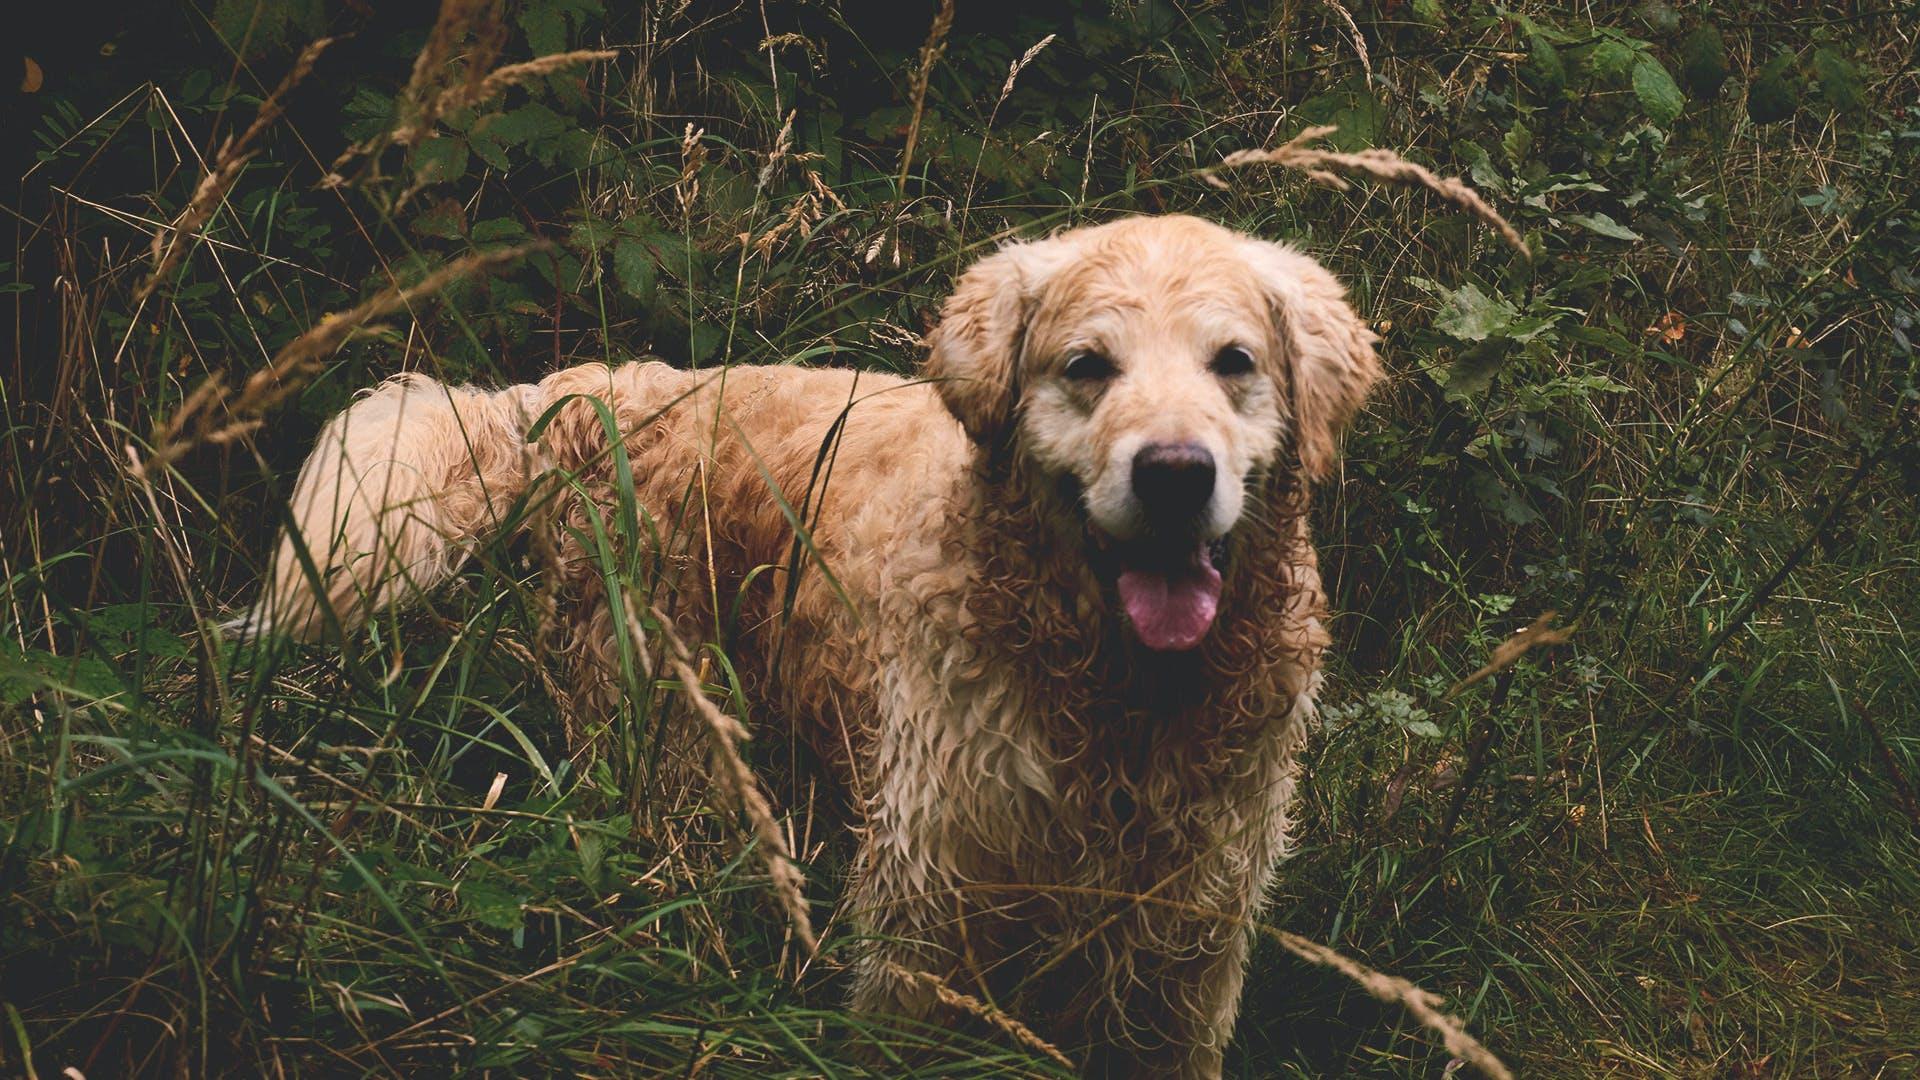 animal, canine, cute